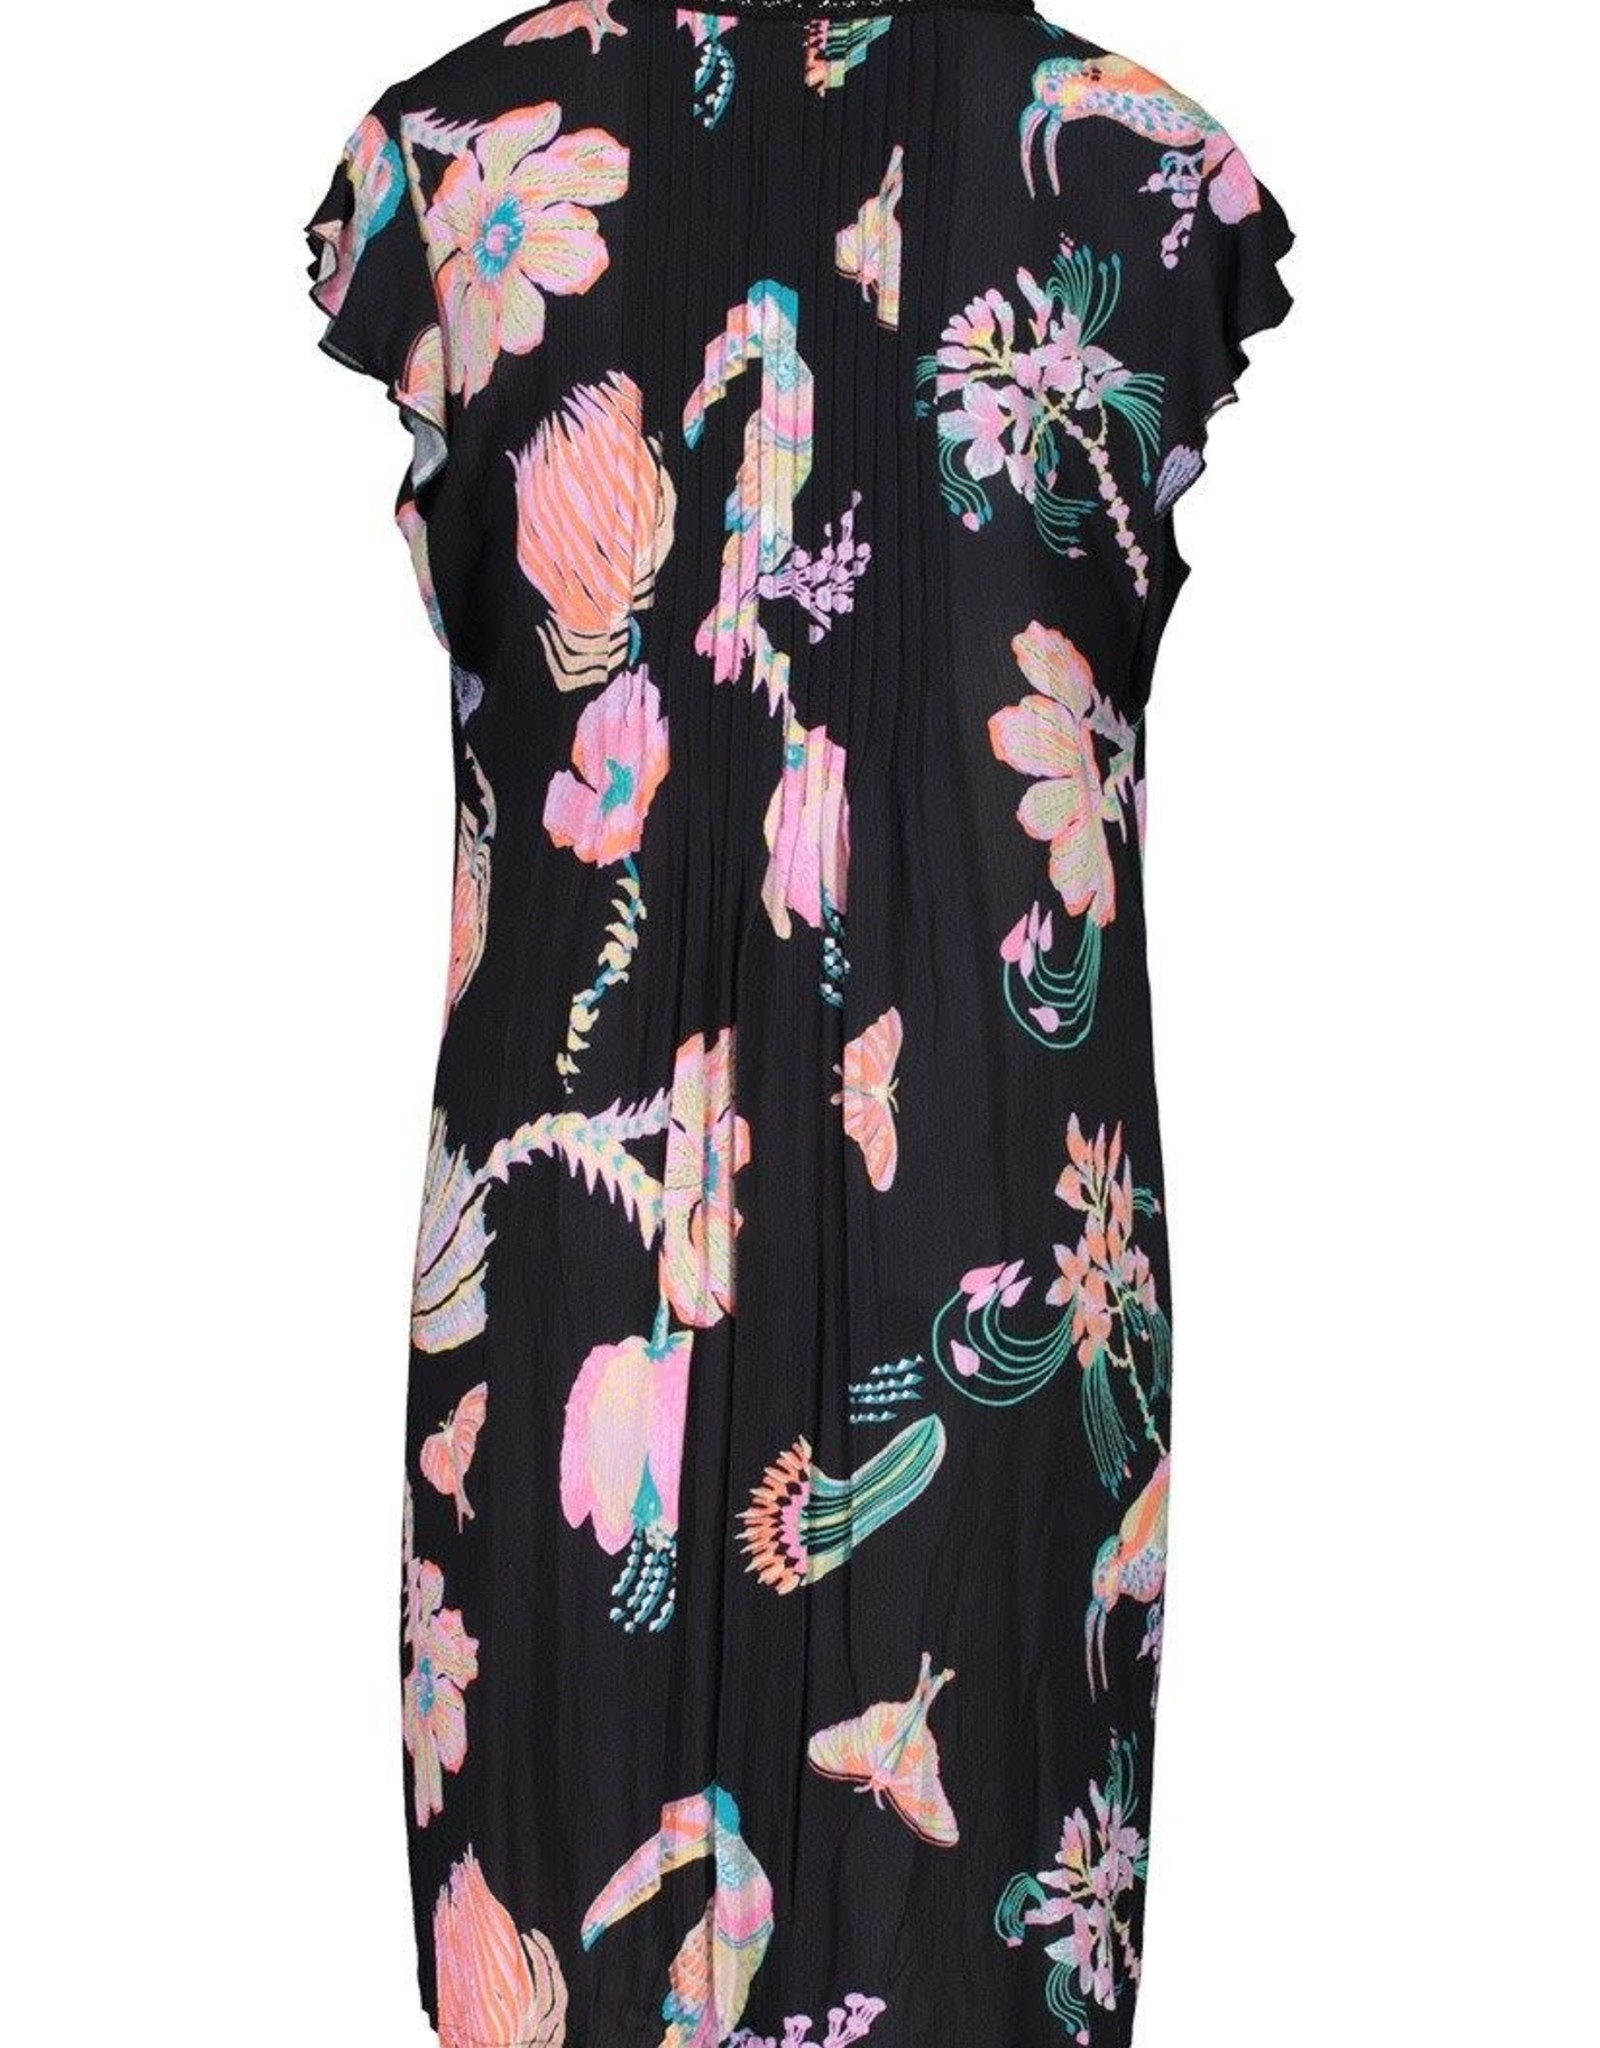 Tribal Black/Pink Tropical Print Dress w/Flutter Sleeve